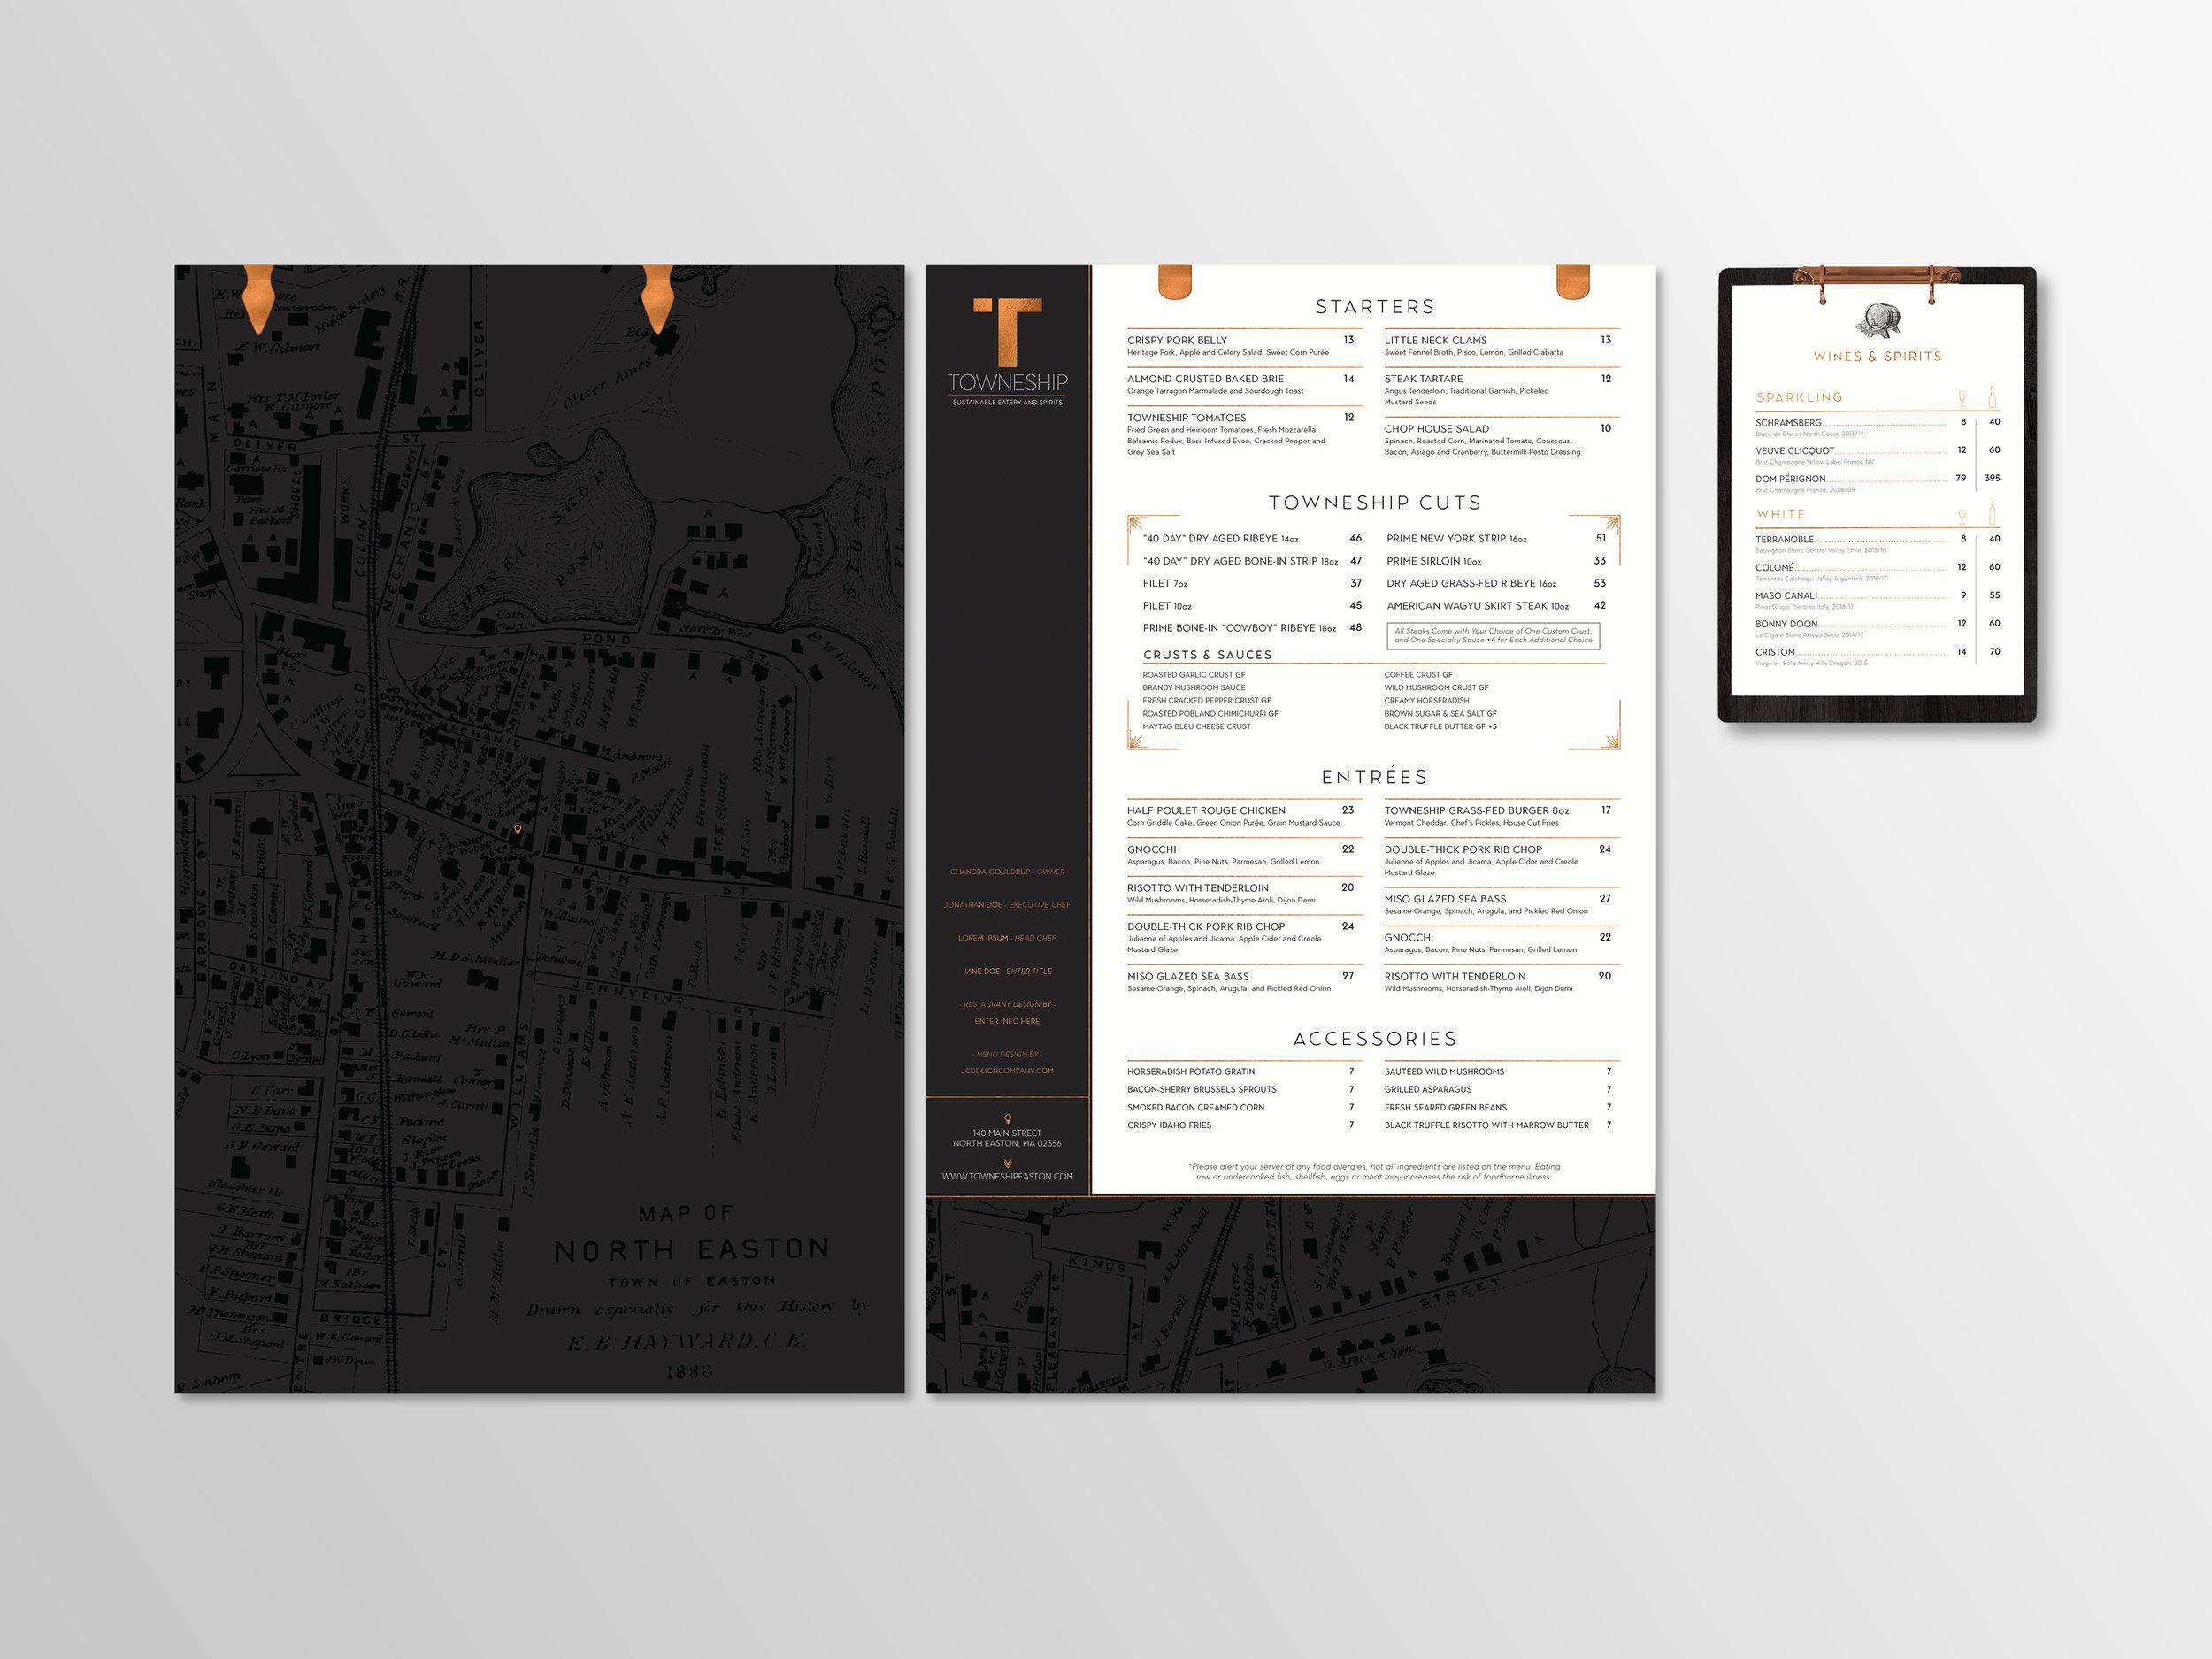 Restaurant Menu Design and Brand Identity Services